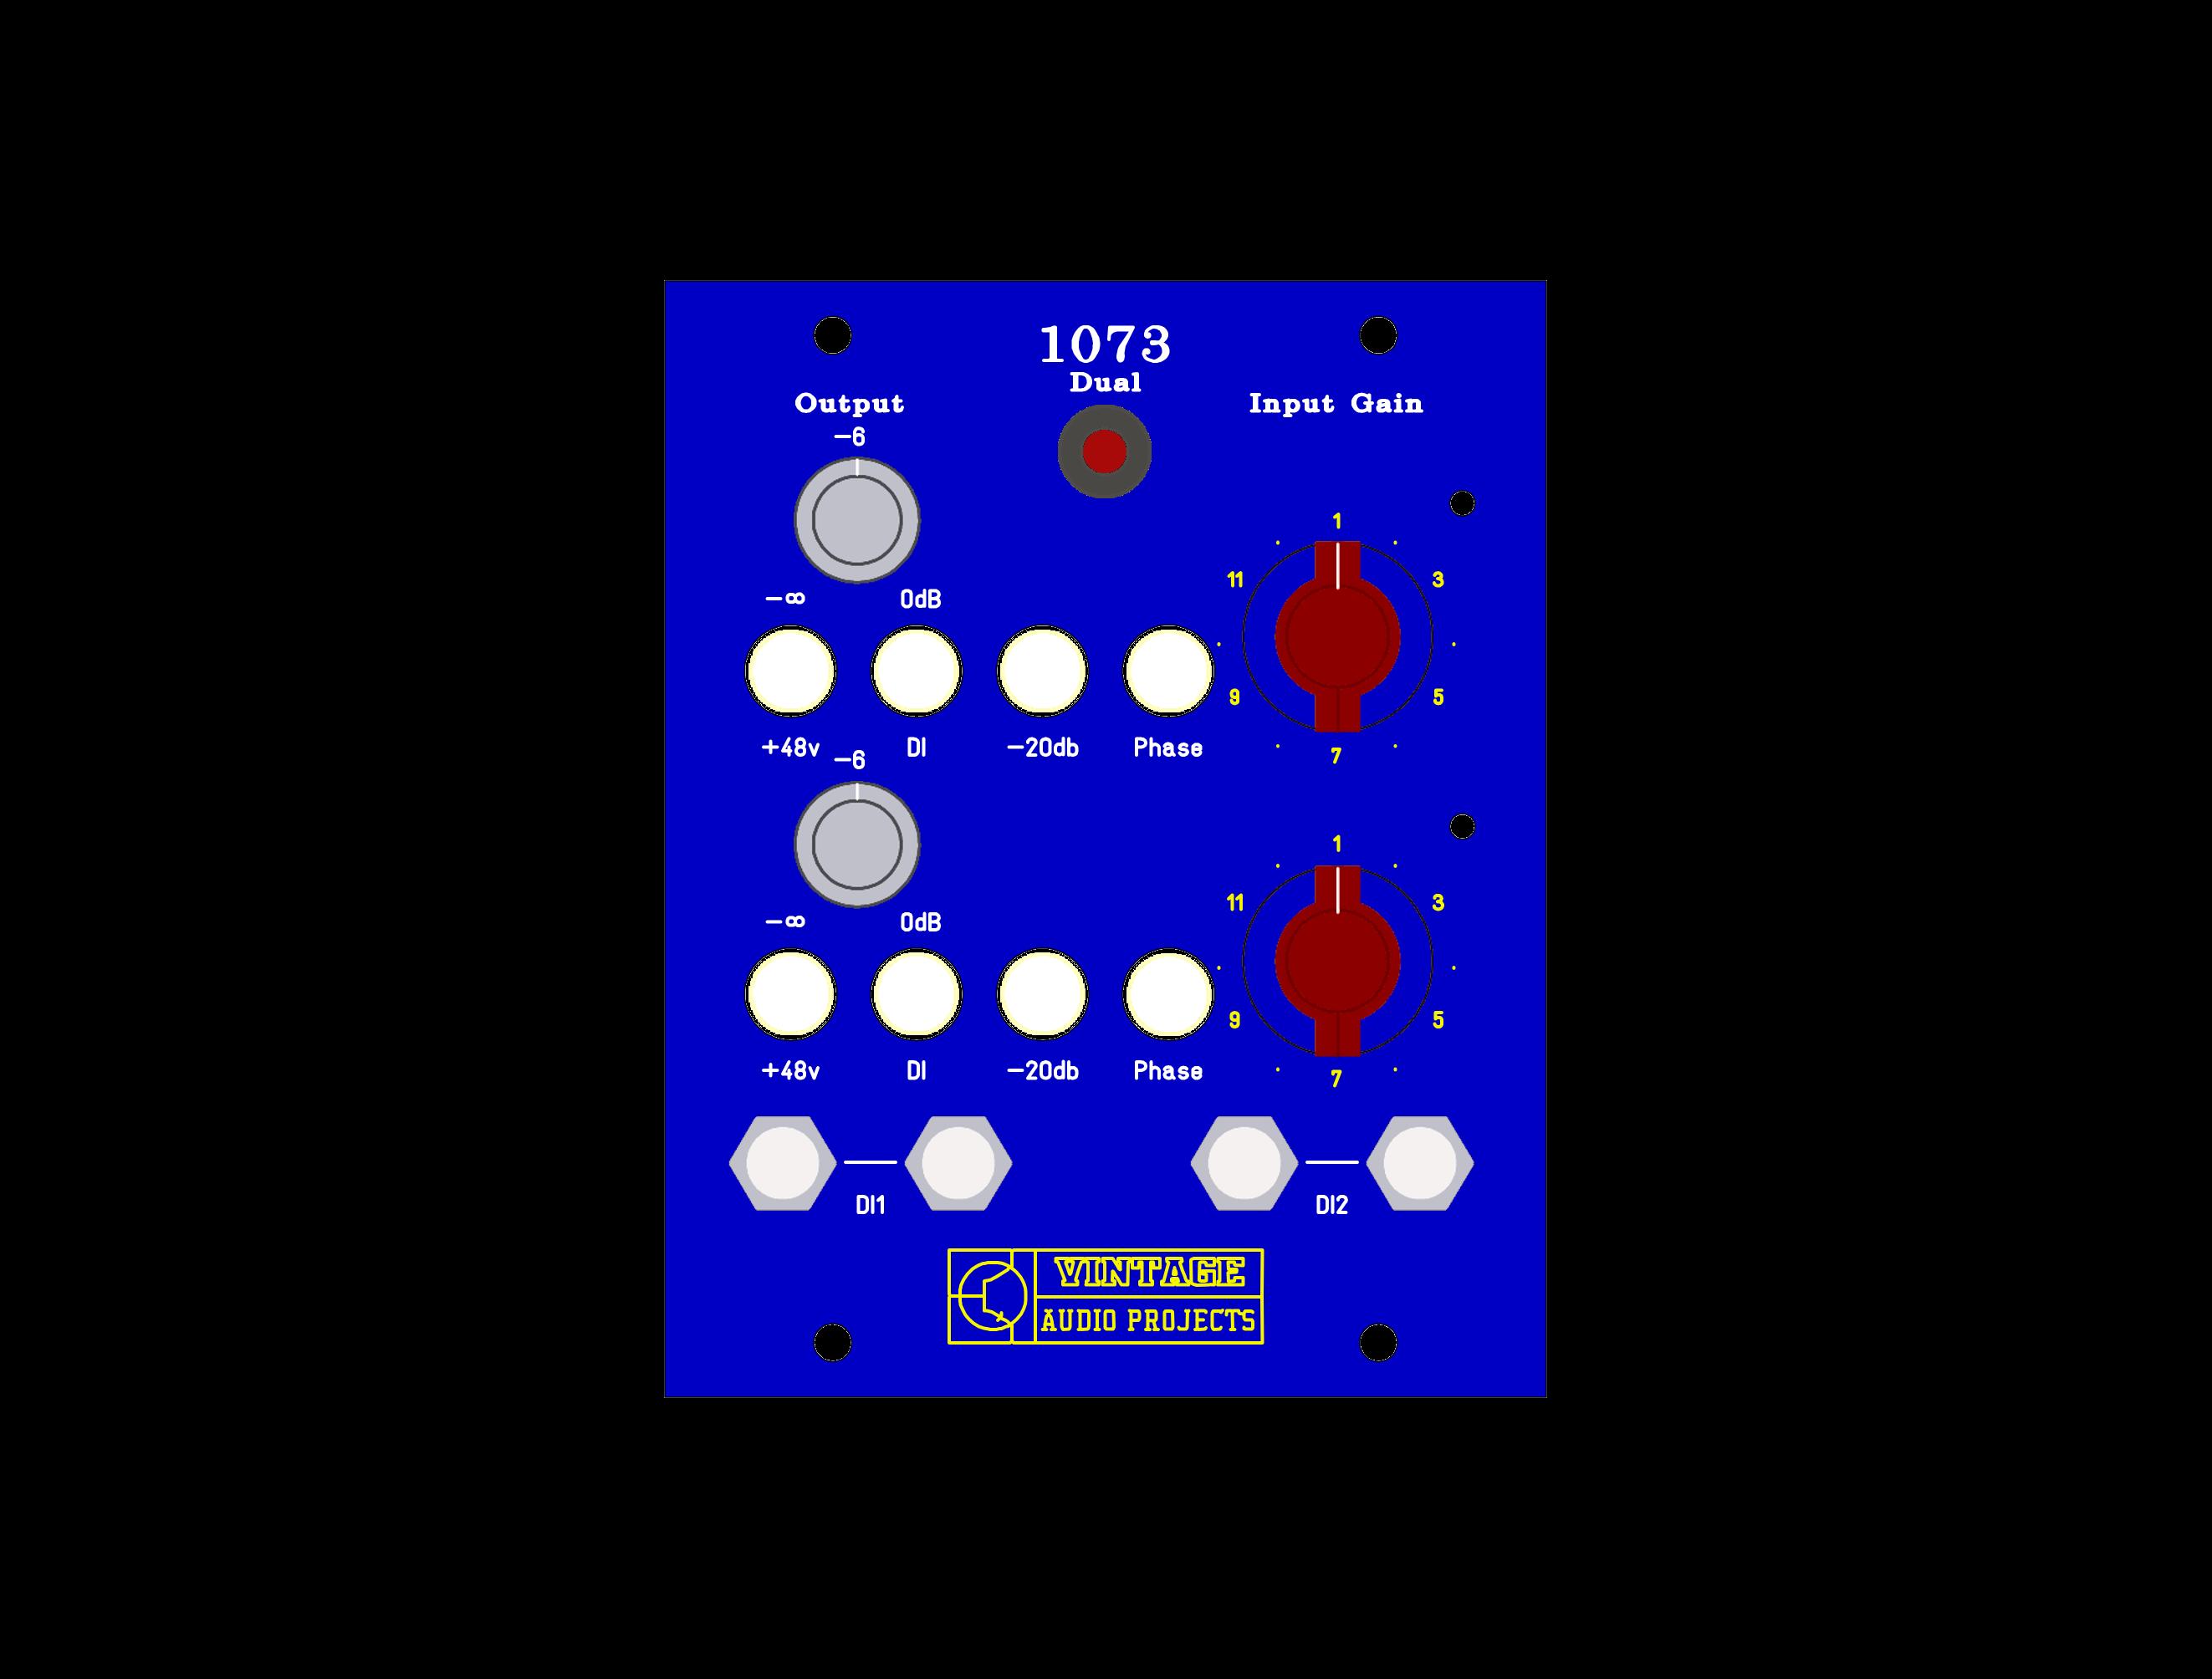 Dual 1073 preamps Desktop (build and tested) [VAP273-D